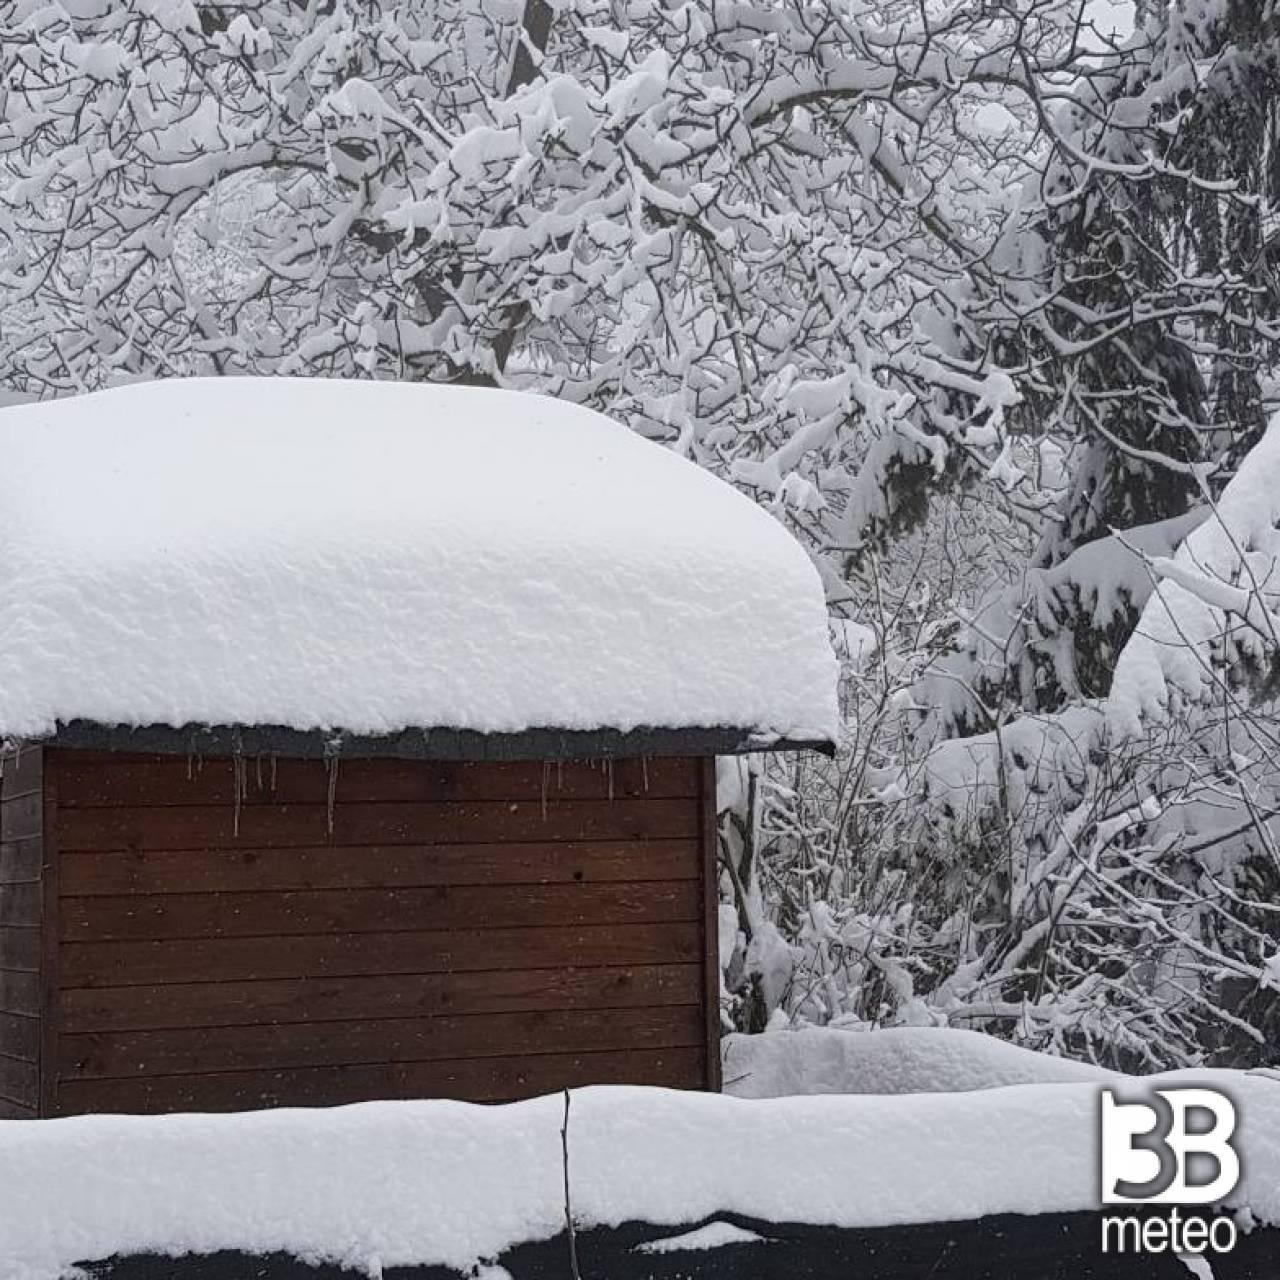 Meteo emilia romagna ancora maltempo venerd neve a tratti in pianura 3b meteo - 3b meteo bagno di romagna ...